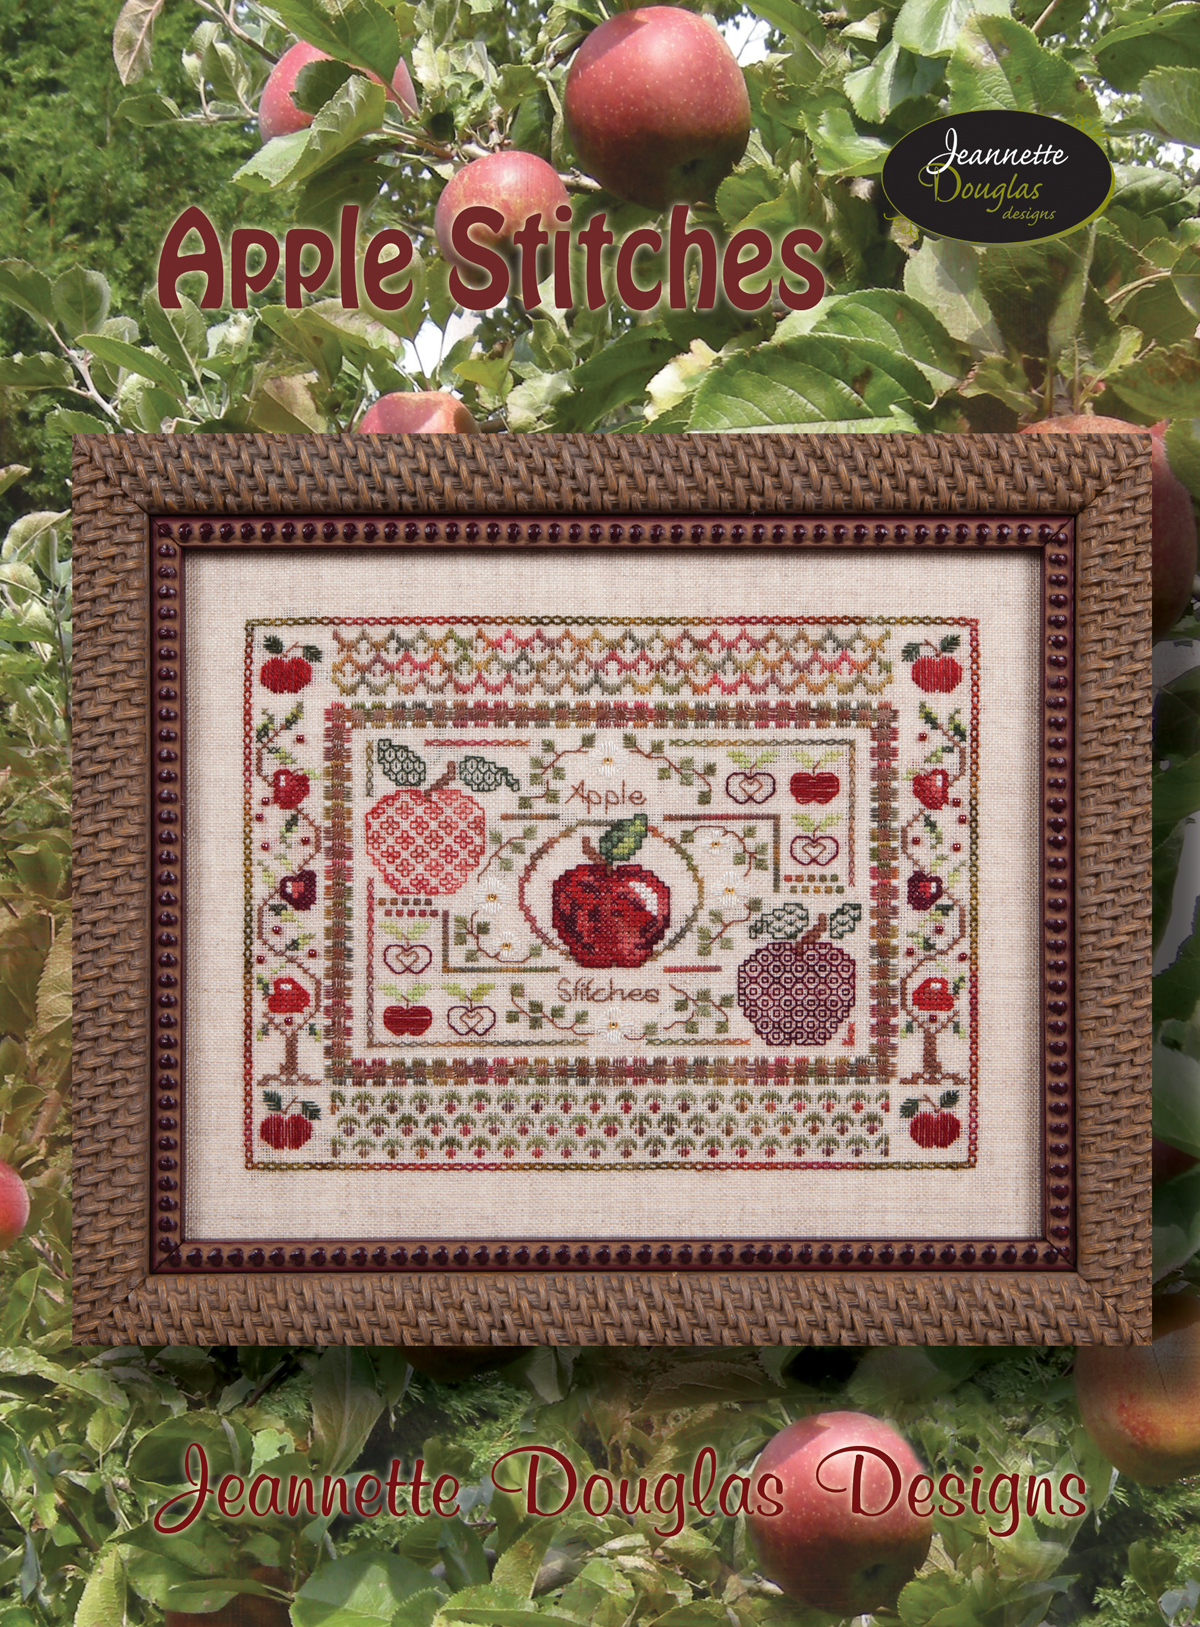 Apple-Stitches-cover-RGB-web.jpg